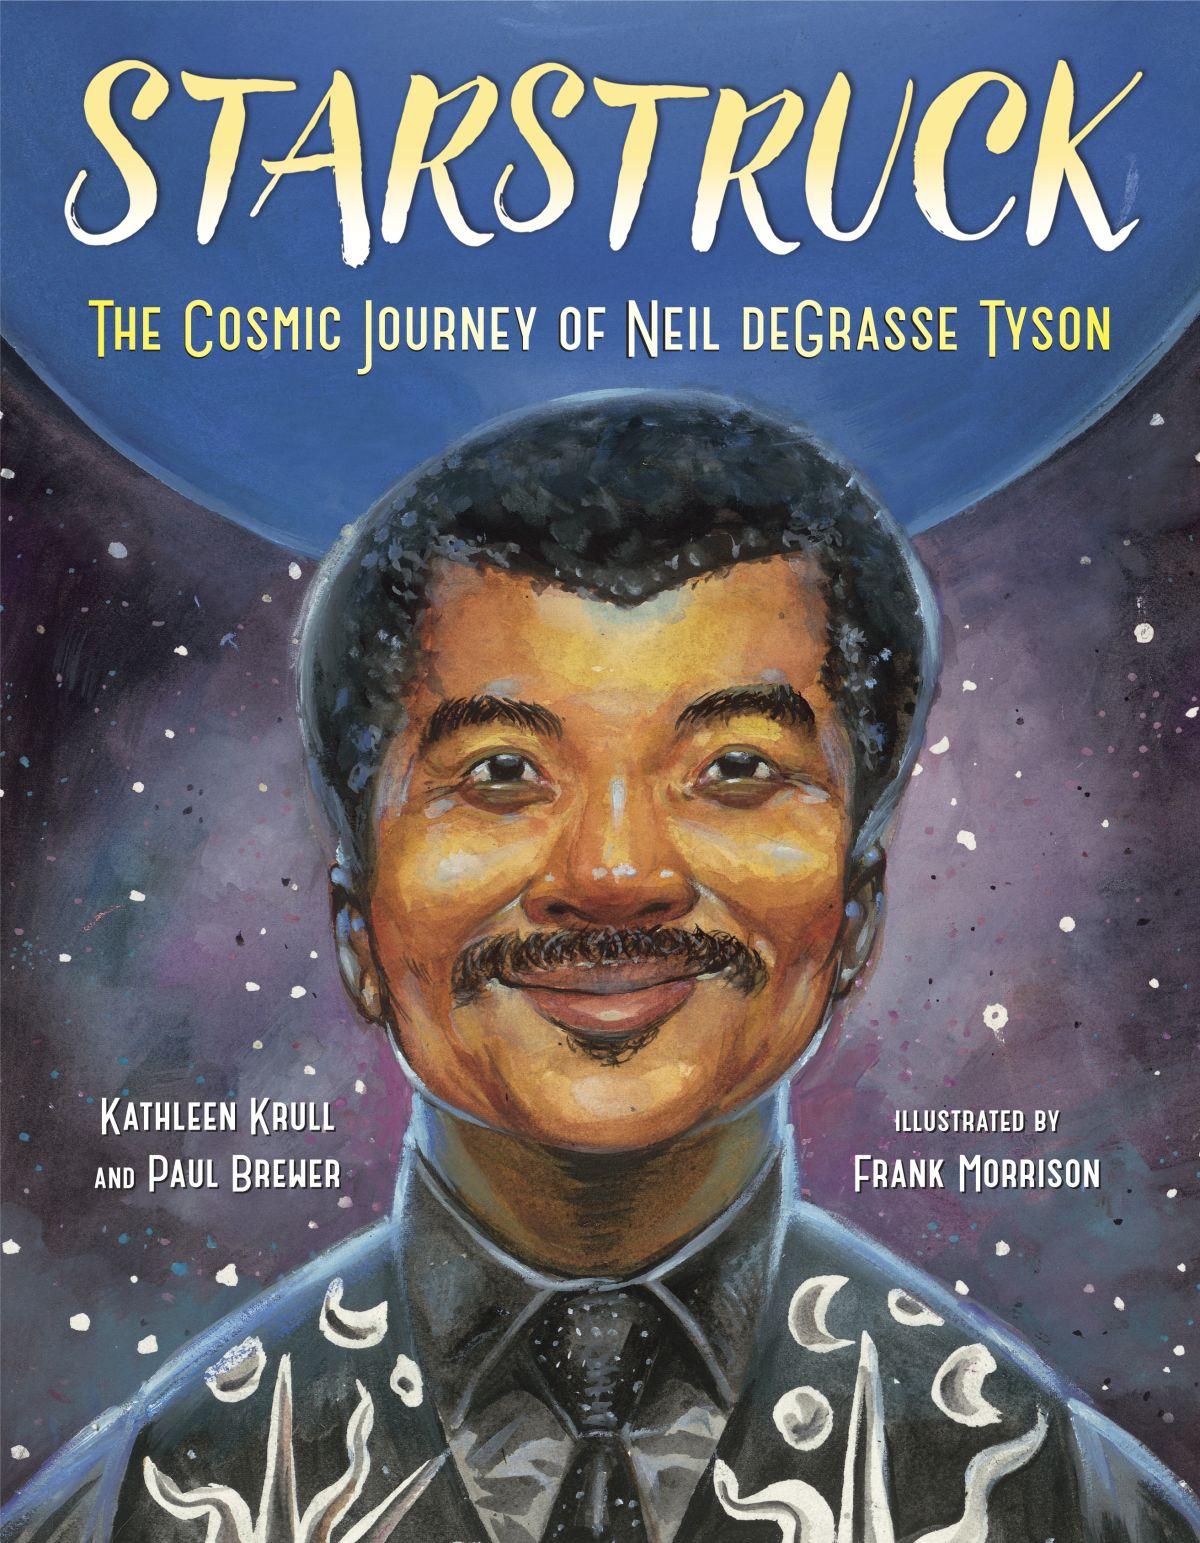 Best Kids' Space Books - Educational Gift Ideas for Children